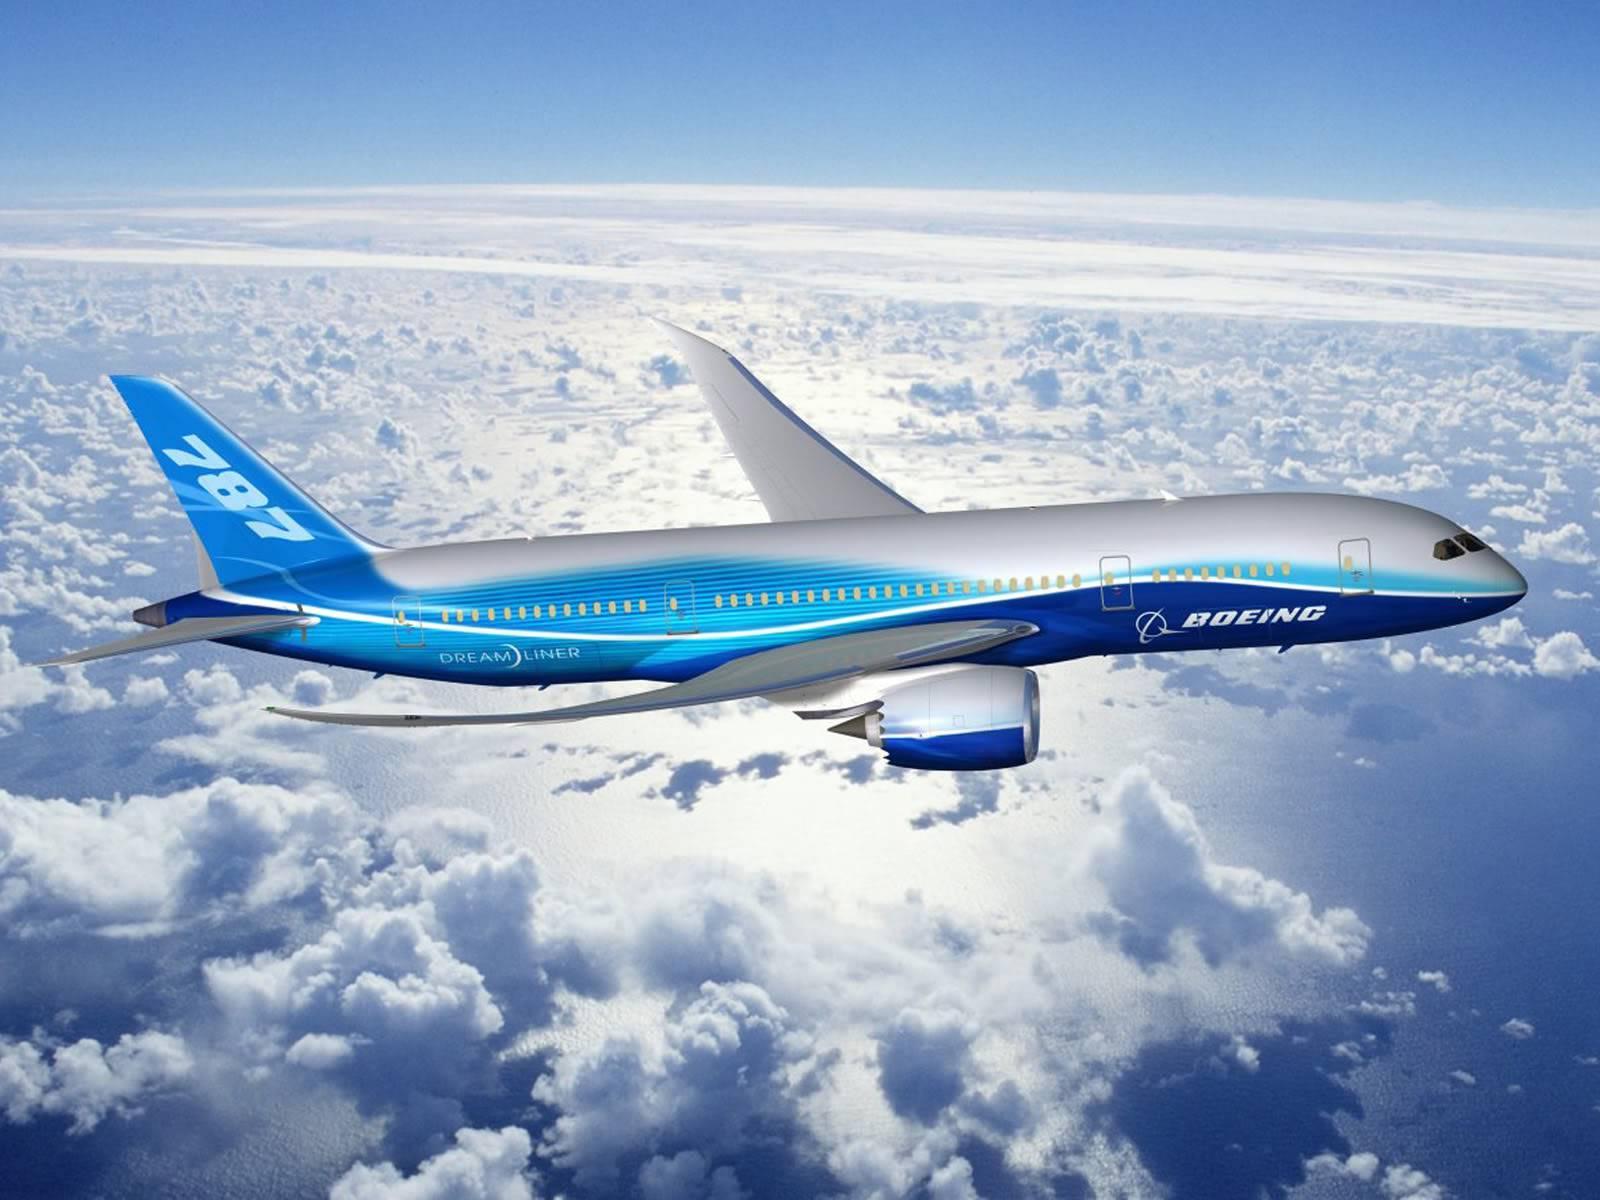 Airplane | 飛行機 | Máy bay Airplane1